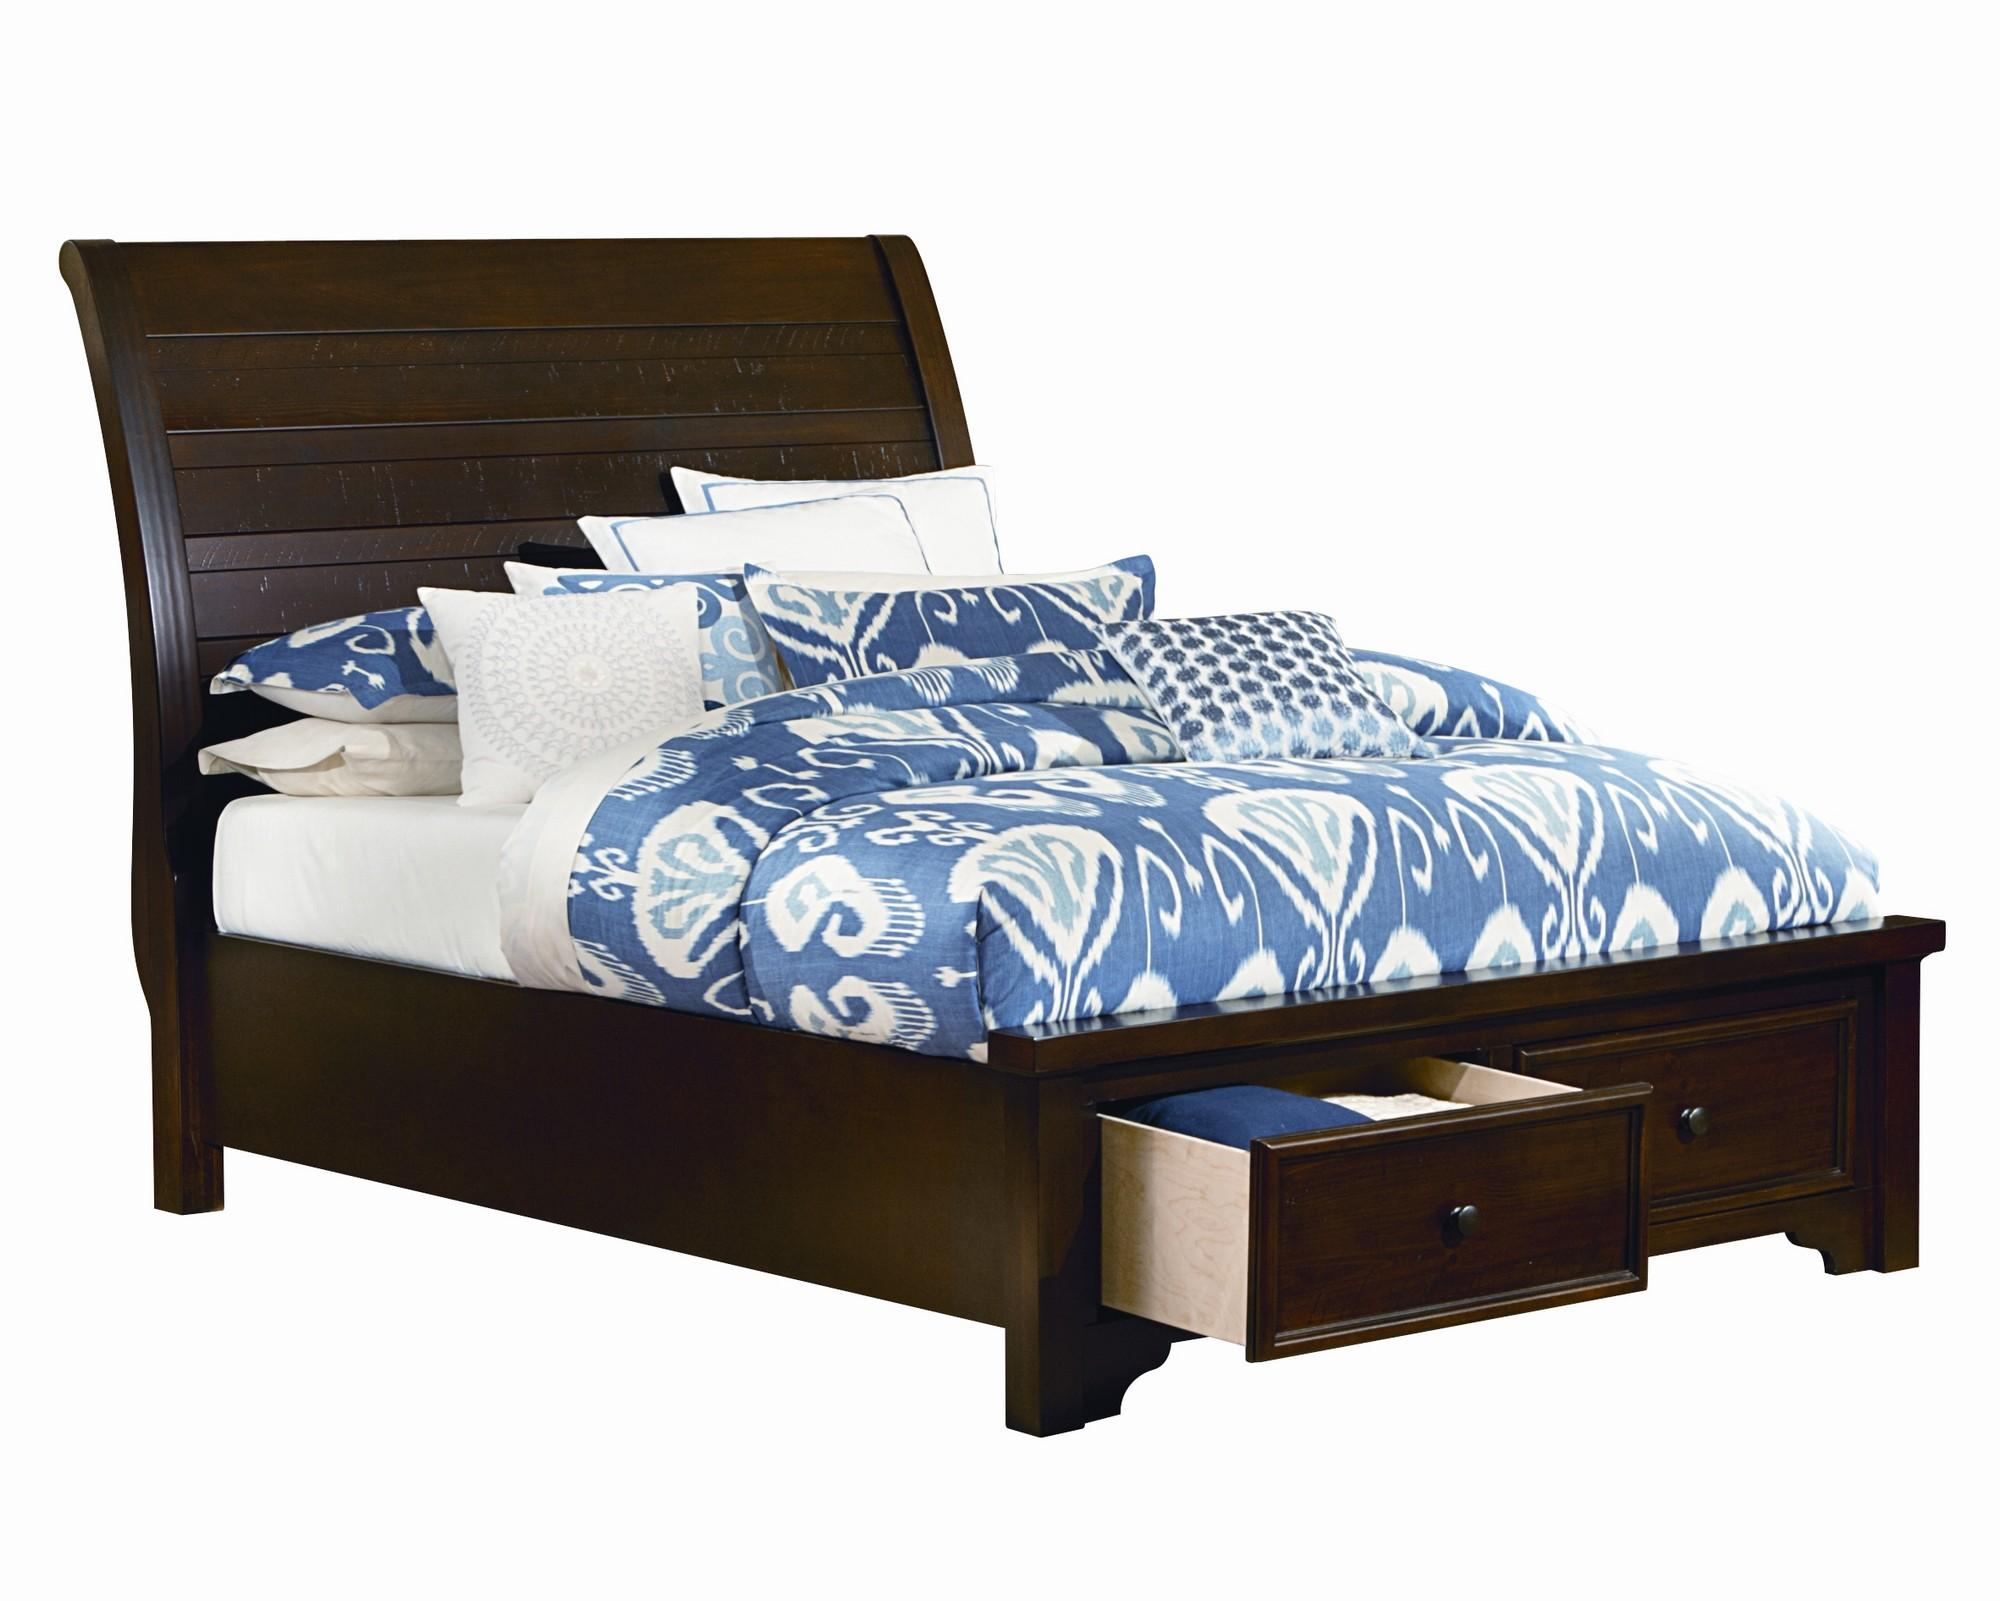 vaughan bassett hanover full sleigh storage bed w low. Black Bedroom Furniture Sets. Home Design Ideas